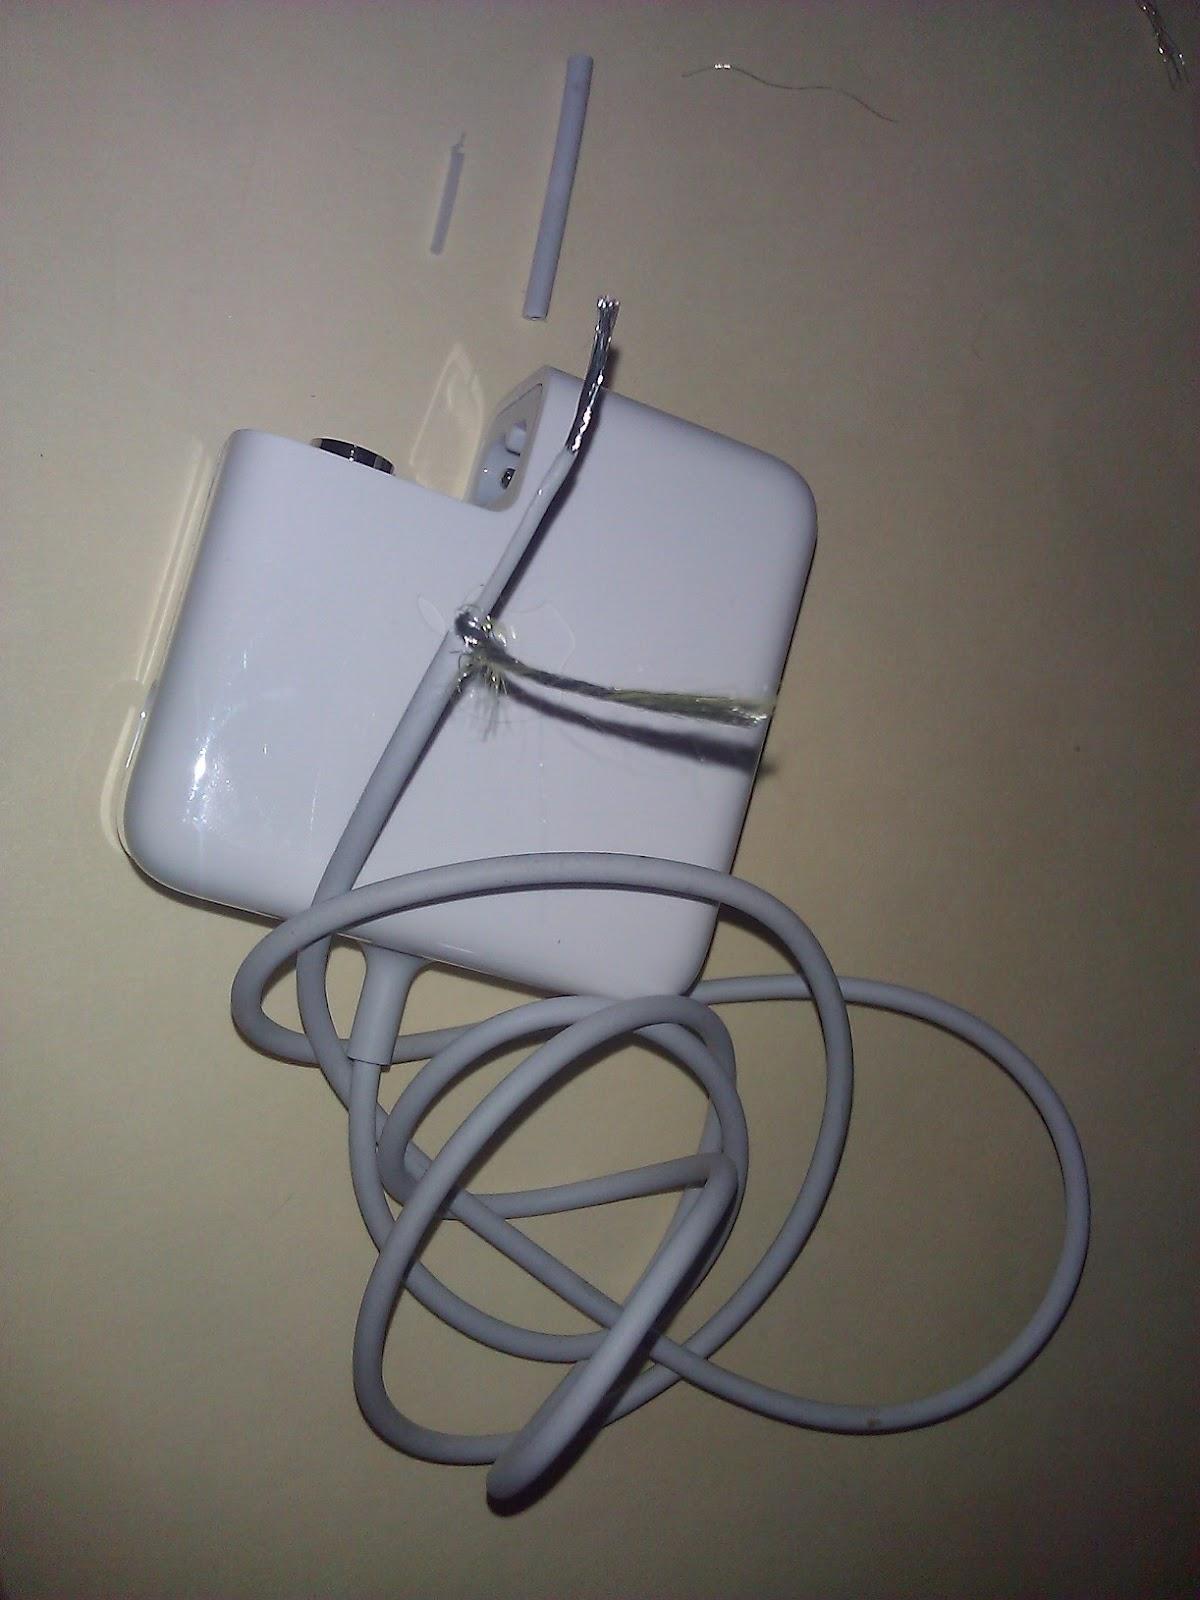 Cat Chewed MacBook Power Cord: Do Not Throw Your Chewed Up MacBook ...